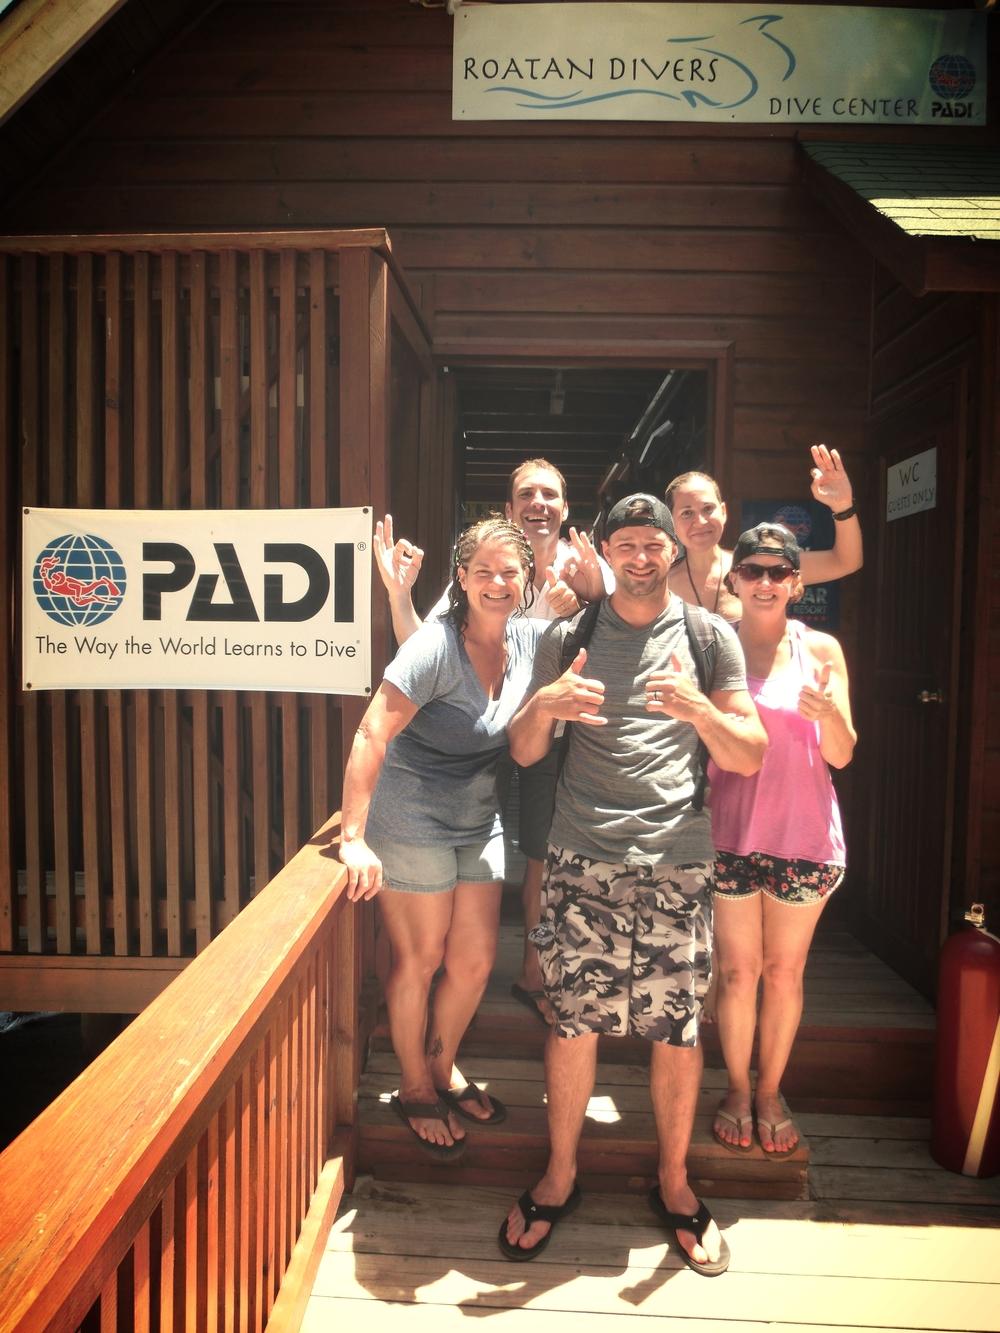 John PADI DSD Roatan Divers